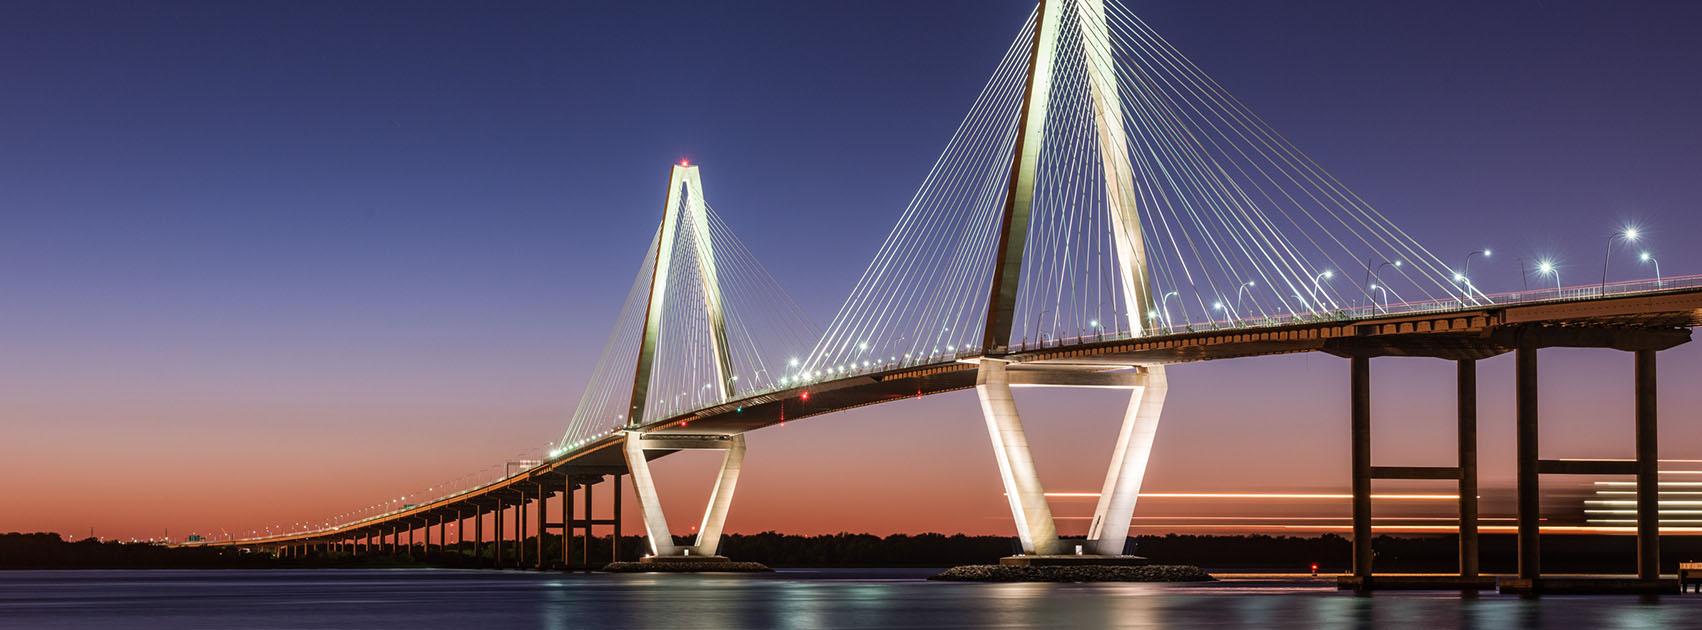 Bridge In South Carolina